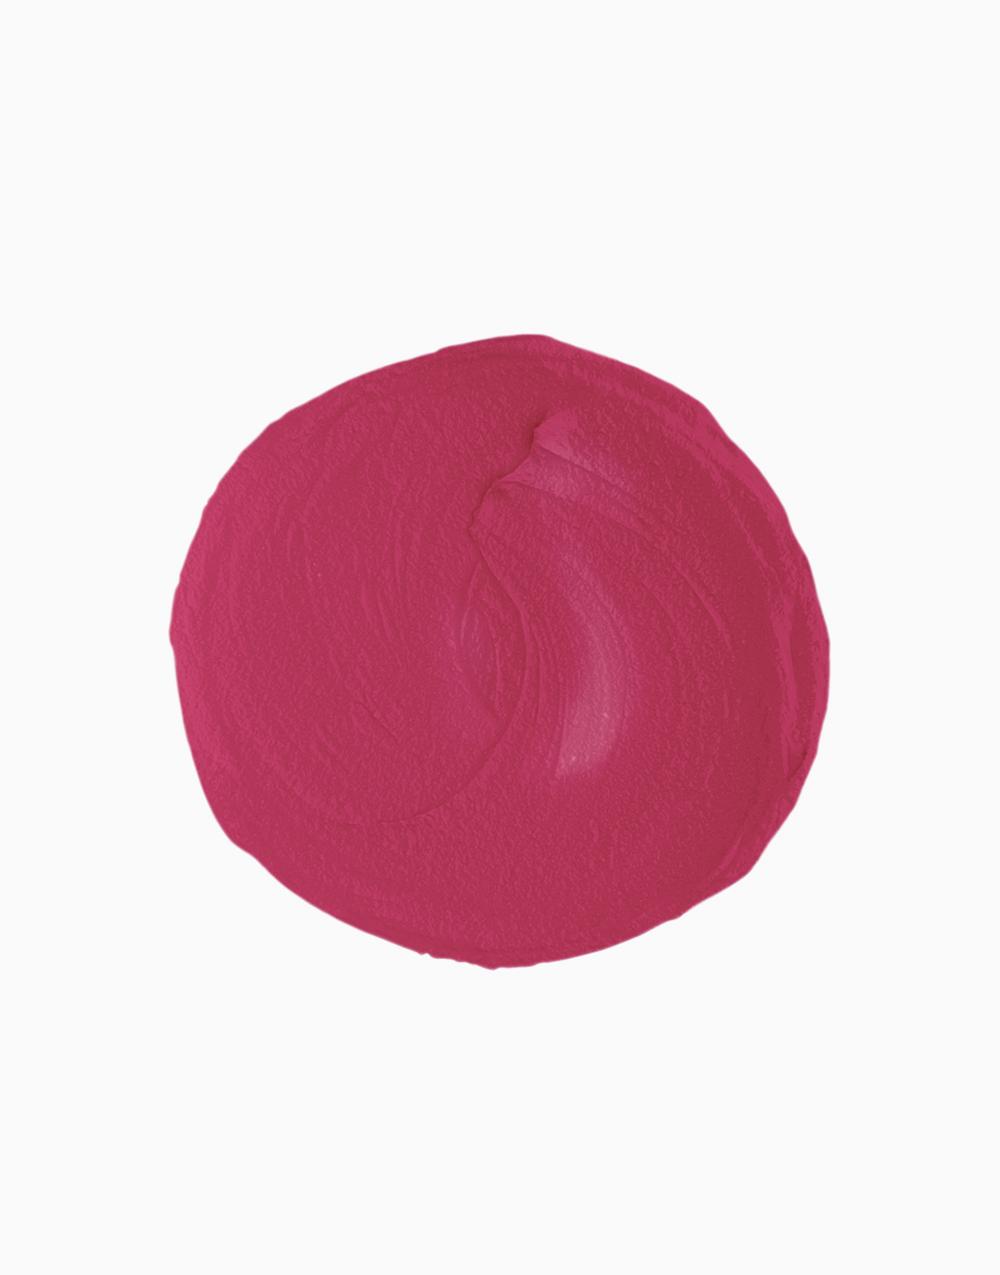 Sunnies Face Airblush [Cream Blush & Cheek Tint] (Razz) by Sunnies Face   Razz